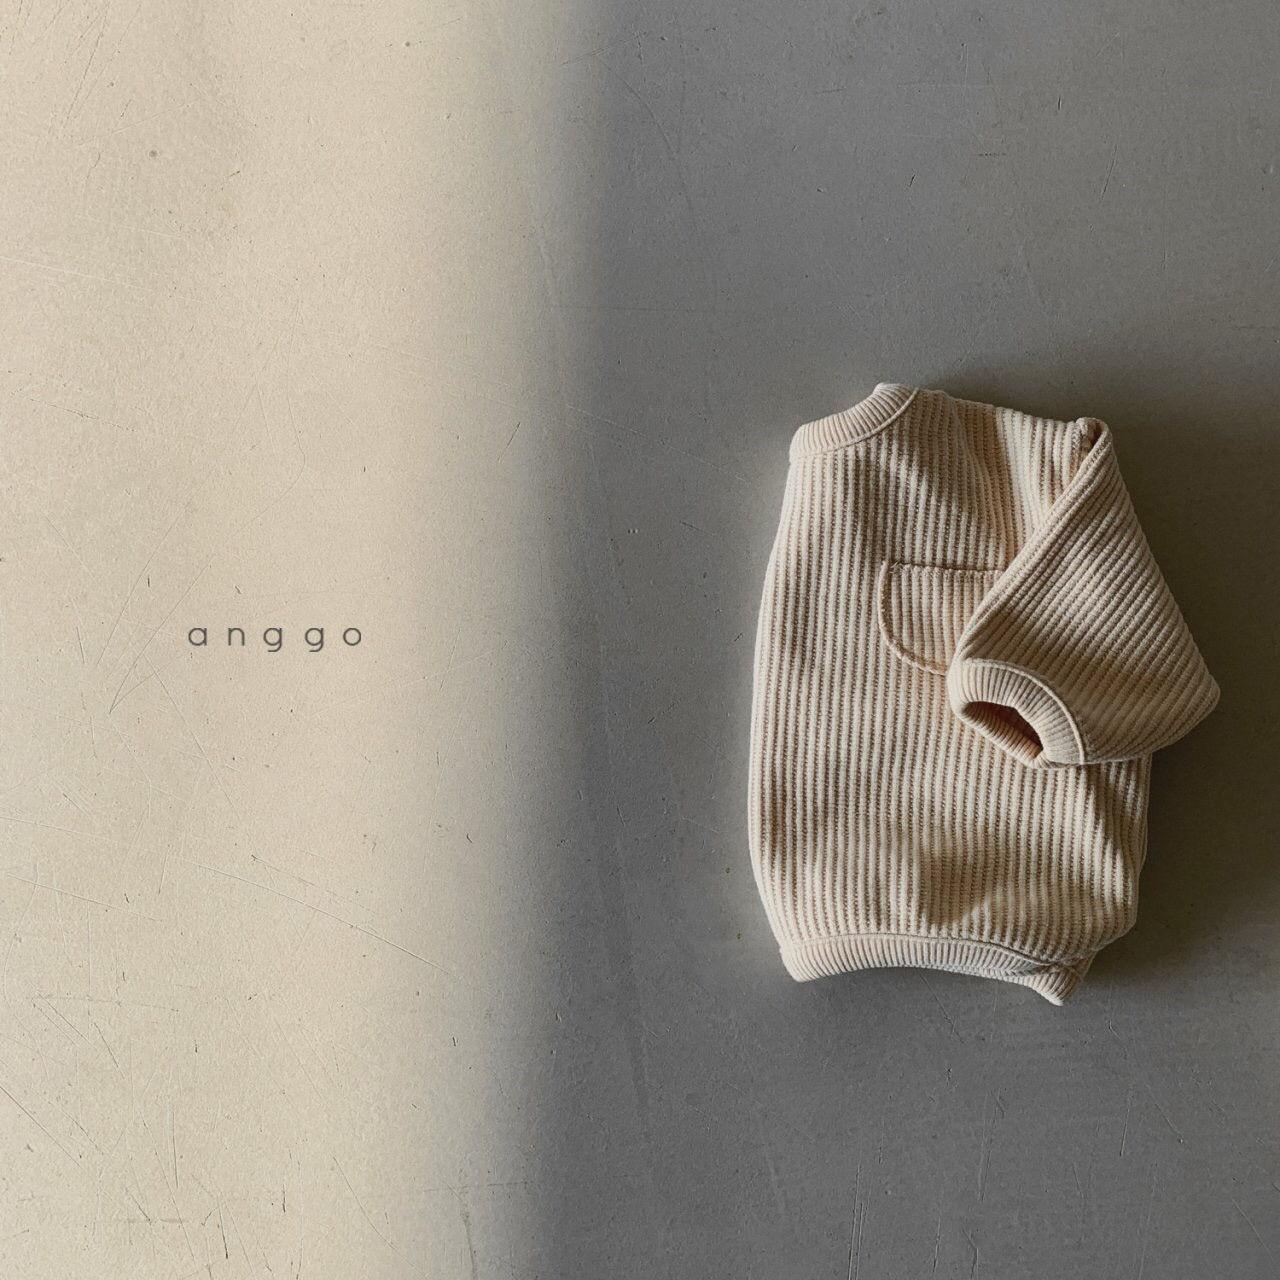 ANGGO - Korean Children Fashion - #Kfashion4kids - Croissant Top Bottom Set - 9